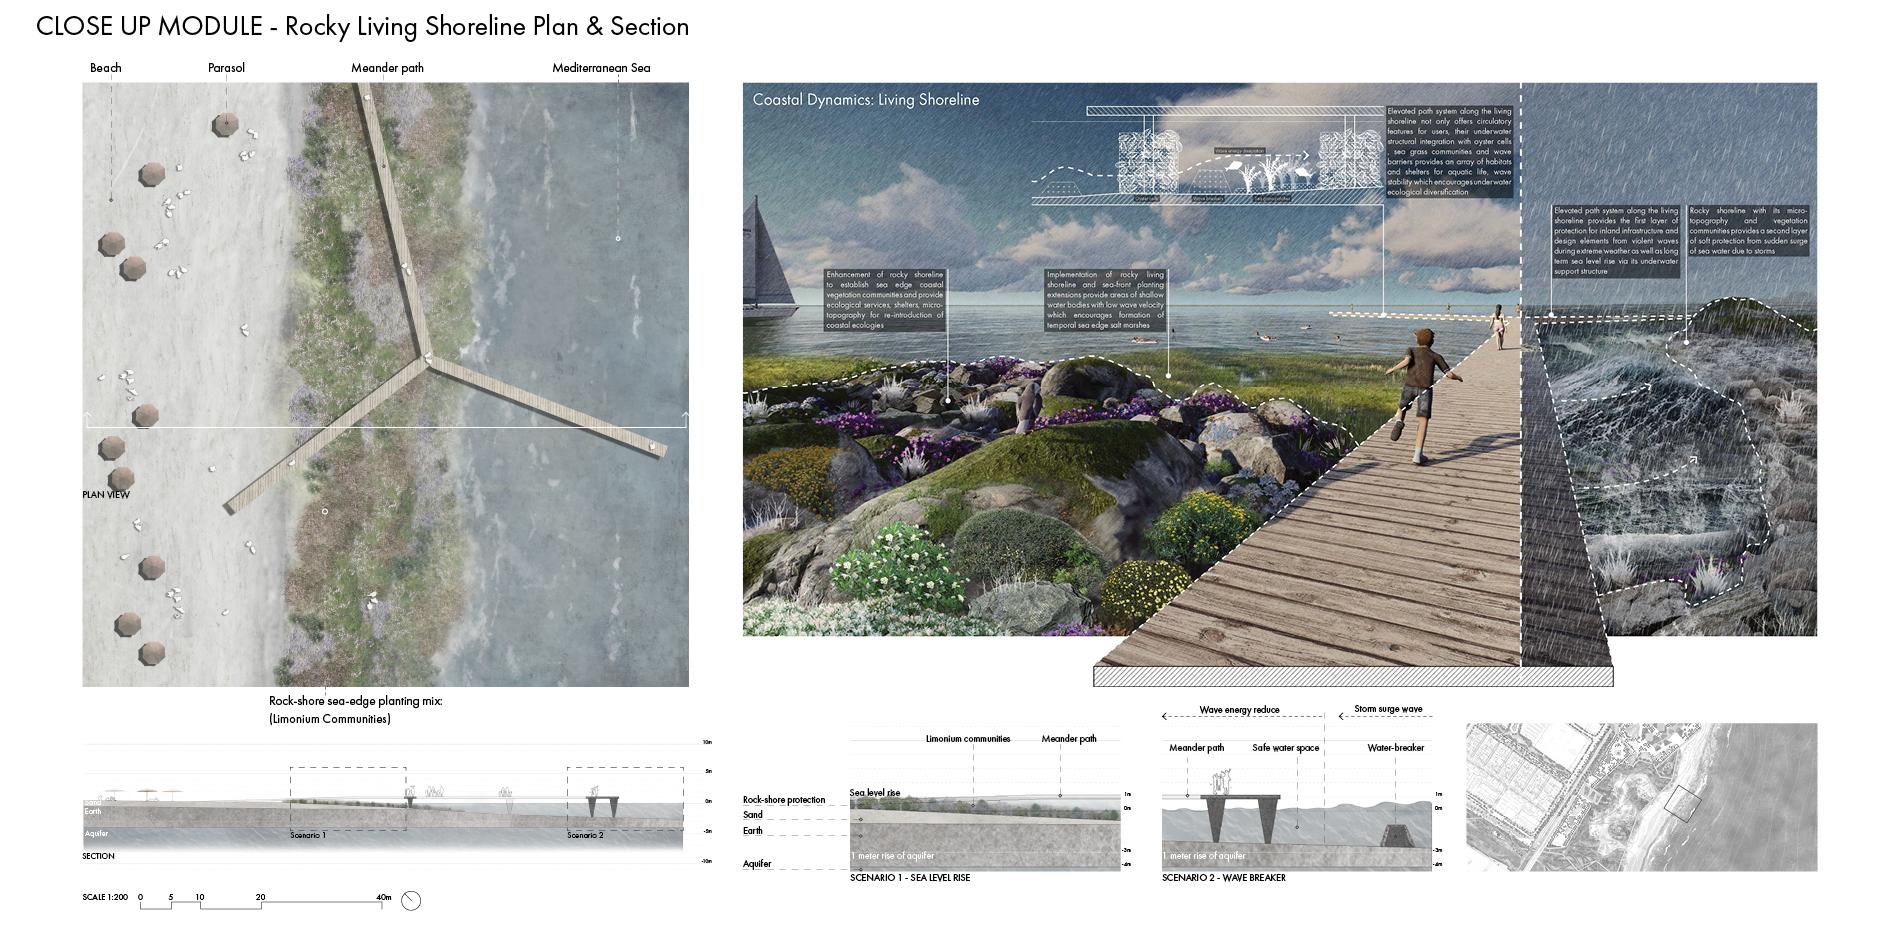 Close Up Module - Rocky Living Shoreline